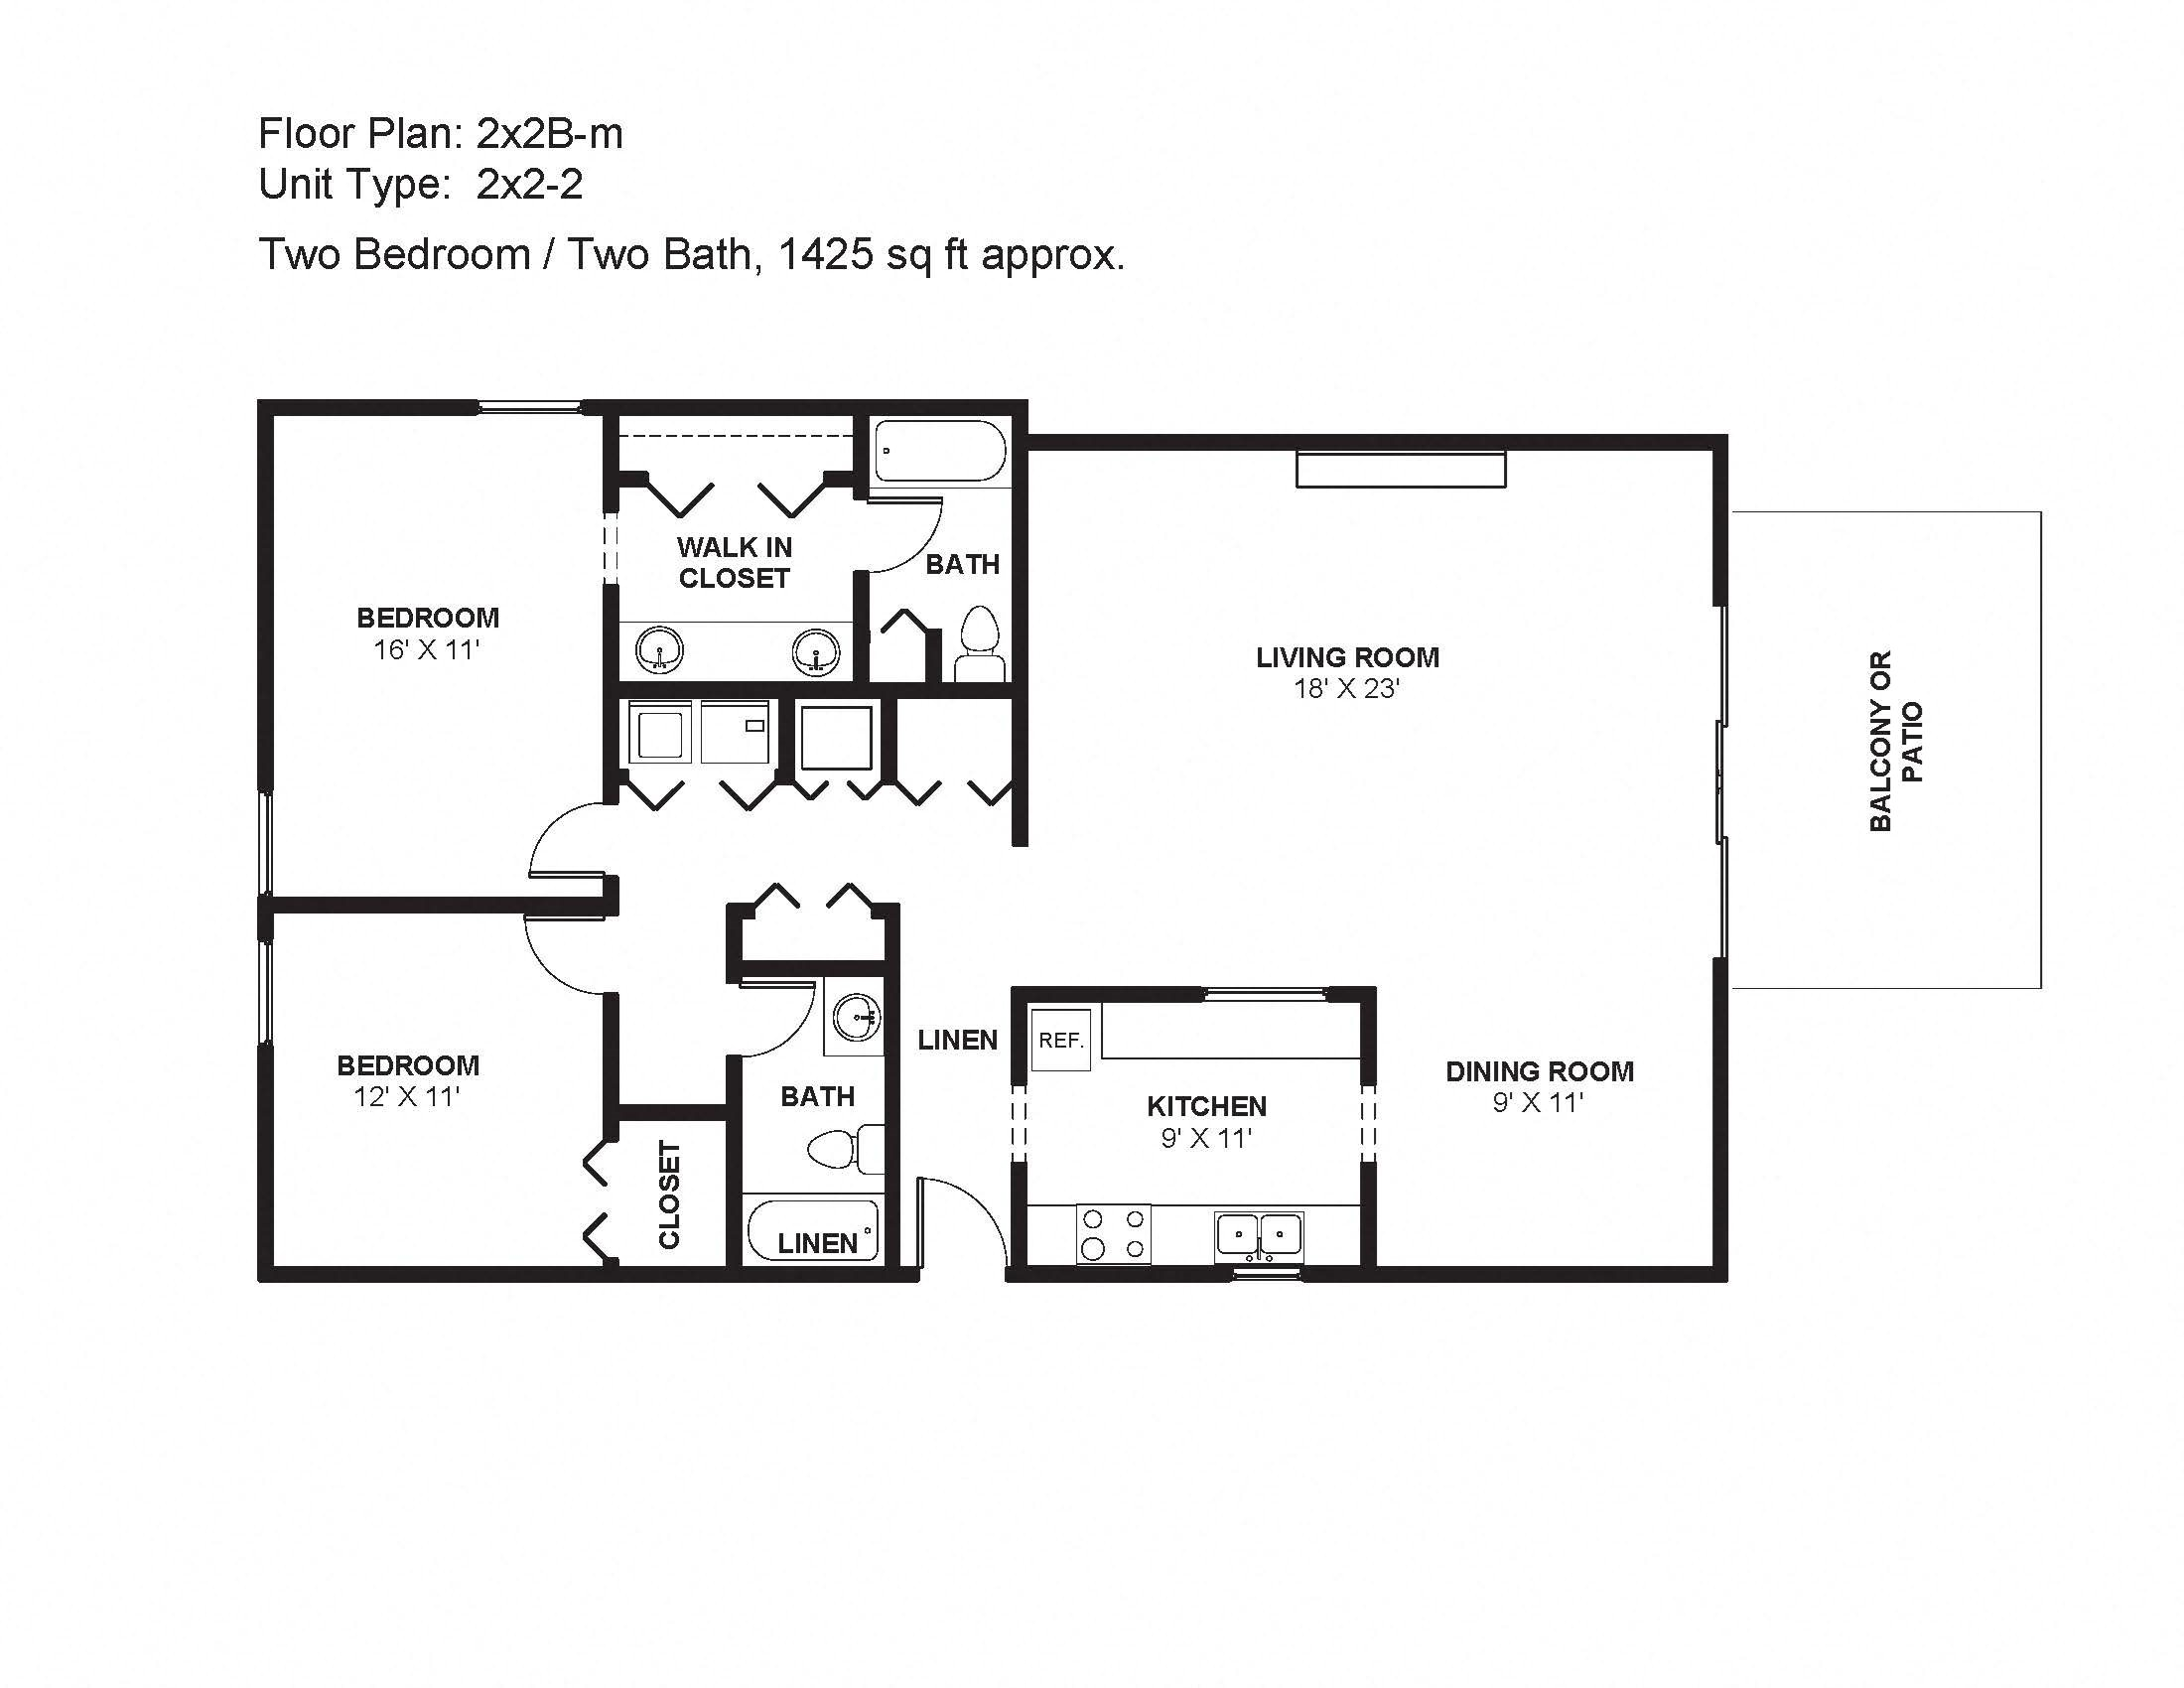 2x2B-m Floor Plan 10